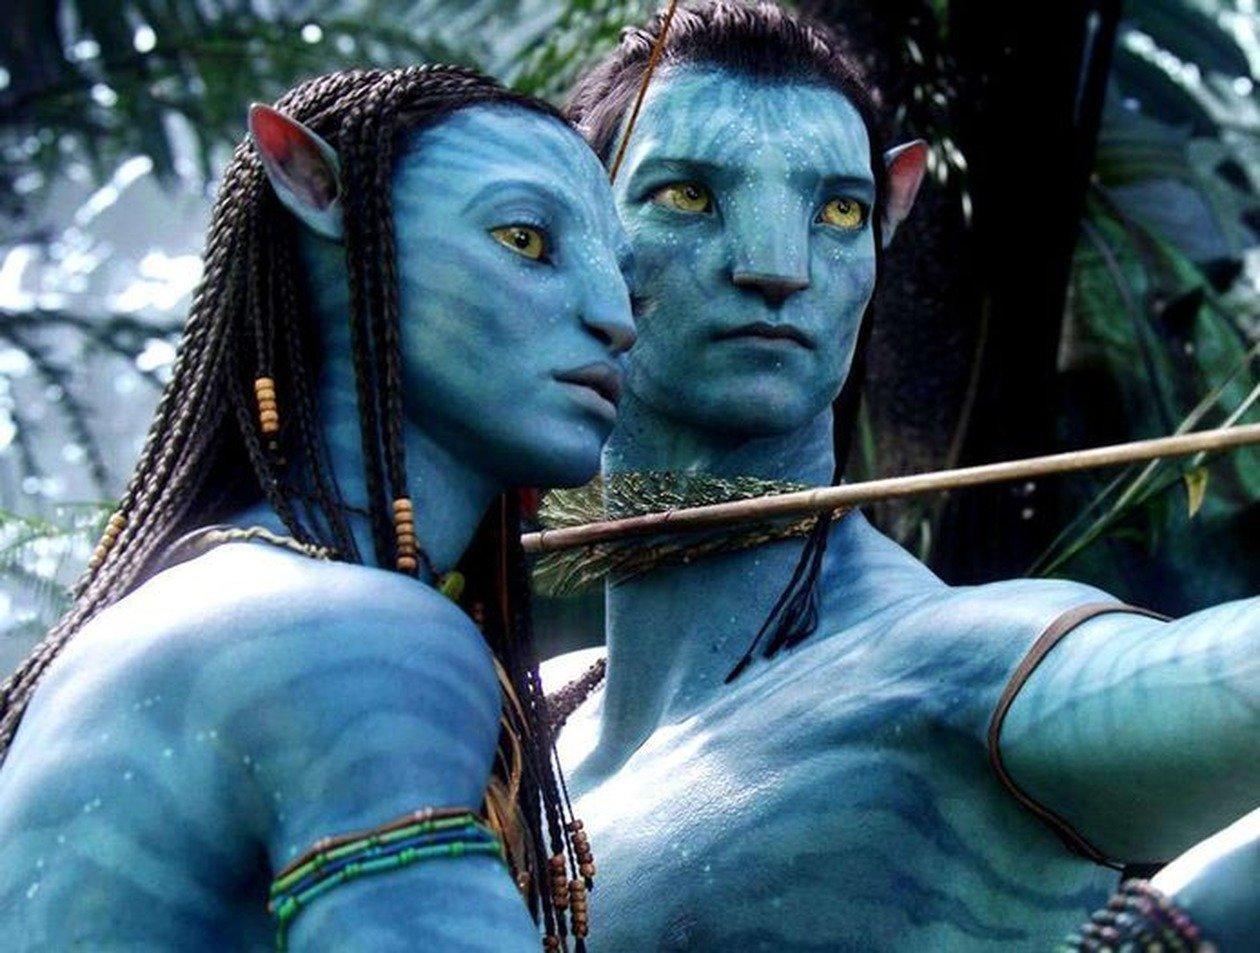 Новое фото со съемок «Аватара 2» с Кейт Уинслет опубликовали в Сети